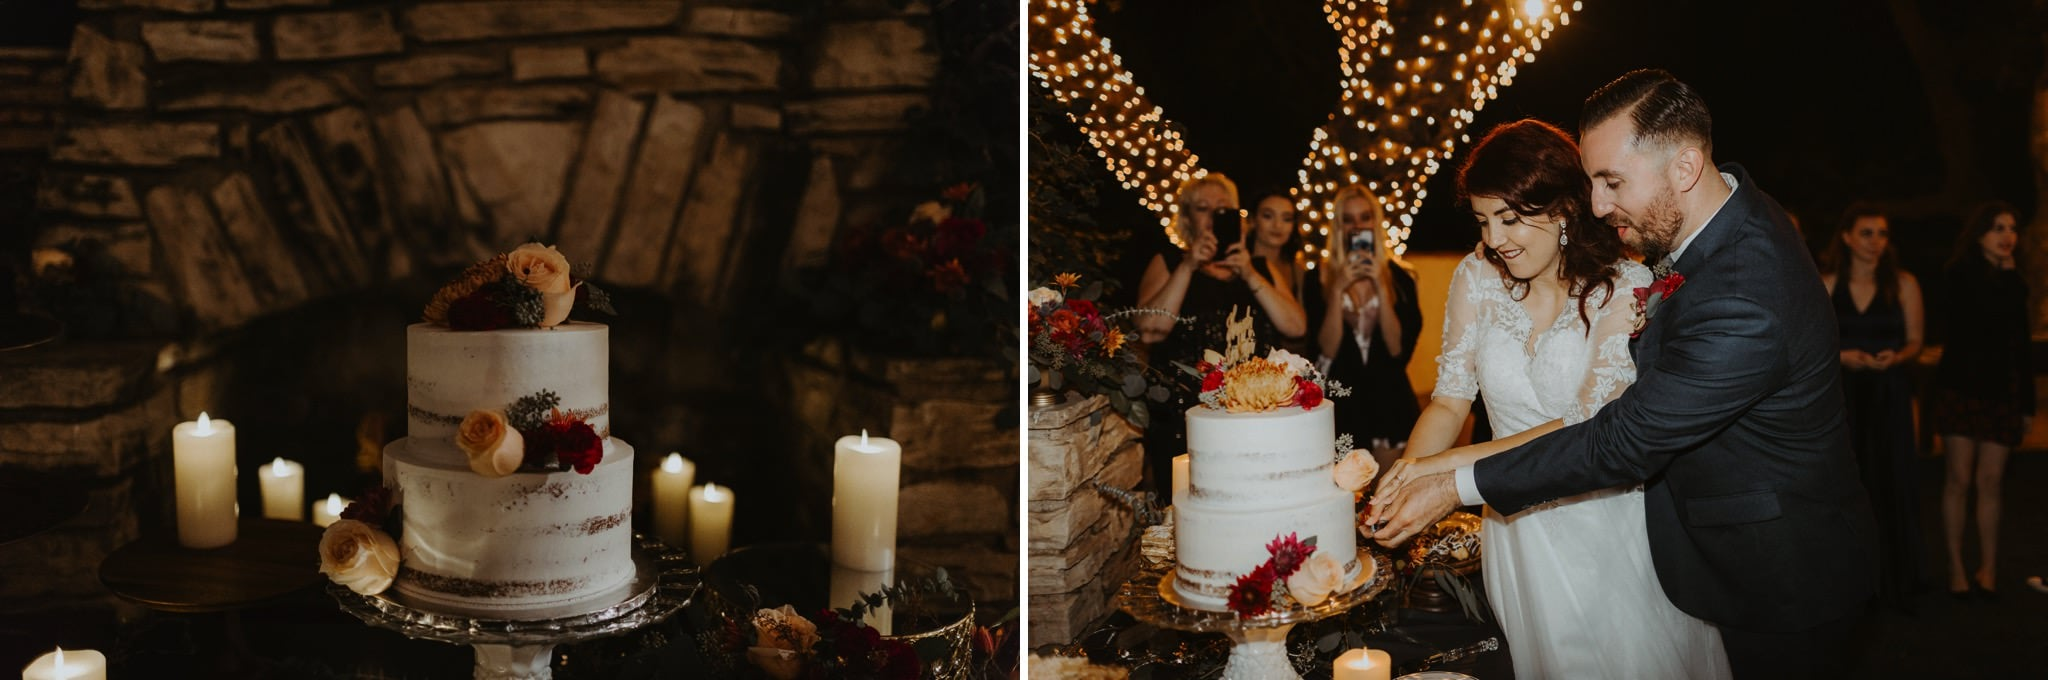 simi valley wedding photography 189